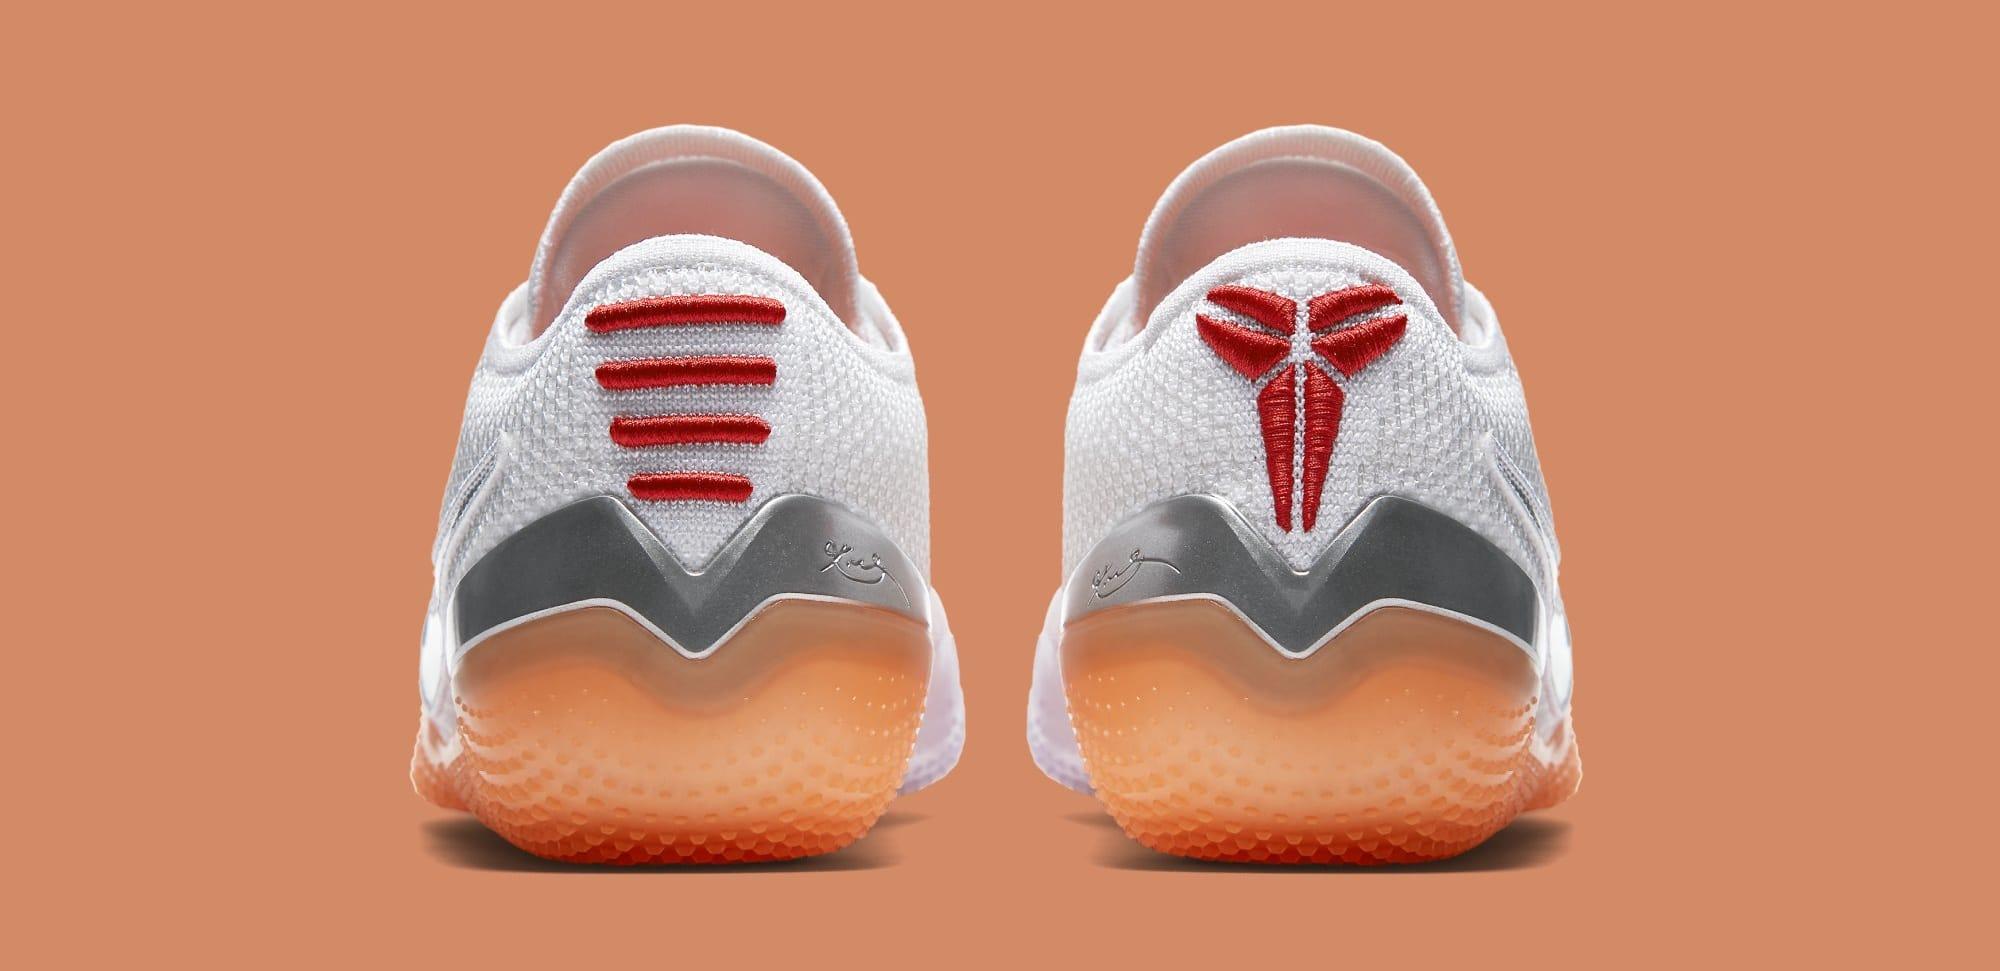 daca0ba664e0 Nike Kobe A.D. NXT 360 White Black Infrared 23 Volt Release Date ...